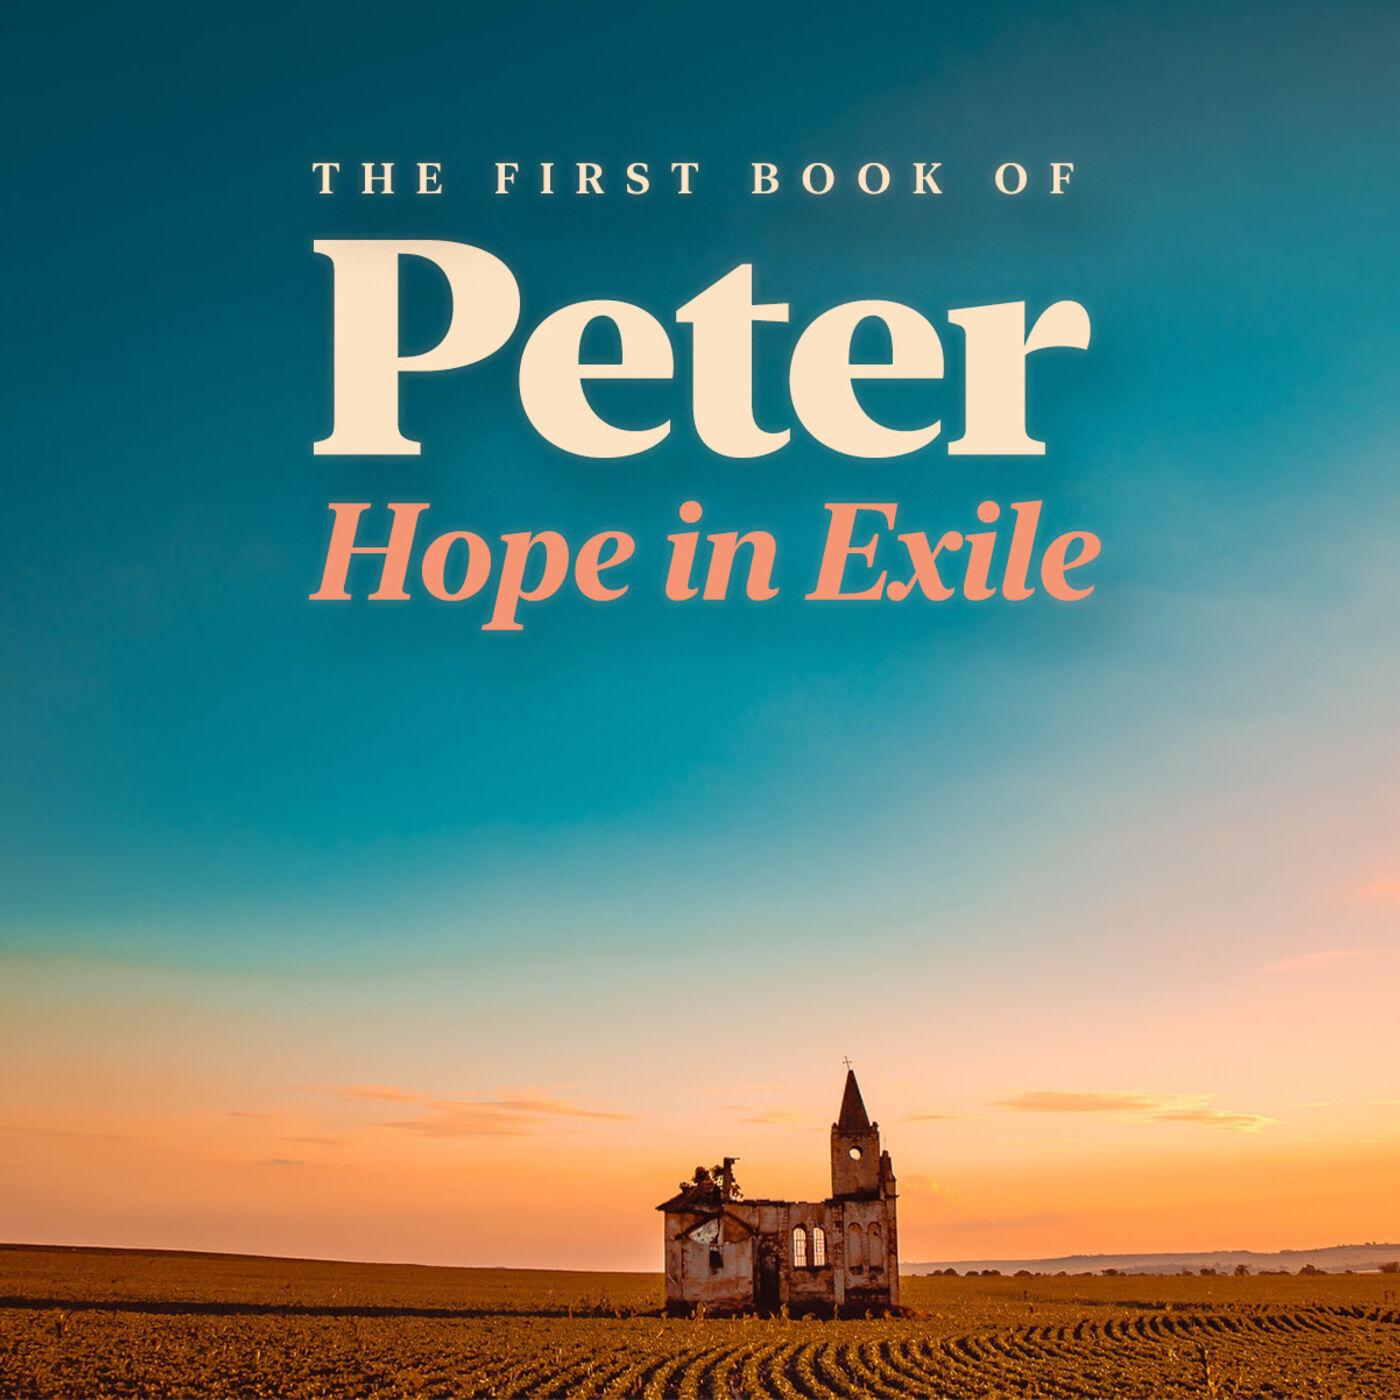 1 Peter 3:13 - 4:6 | Pastor Dale Stinson